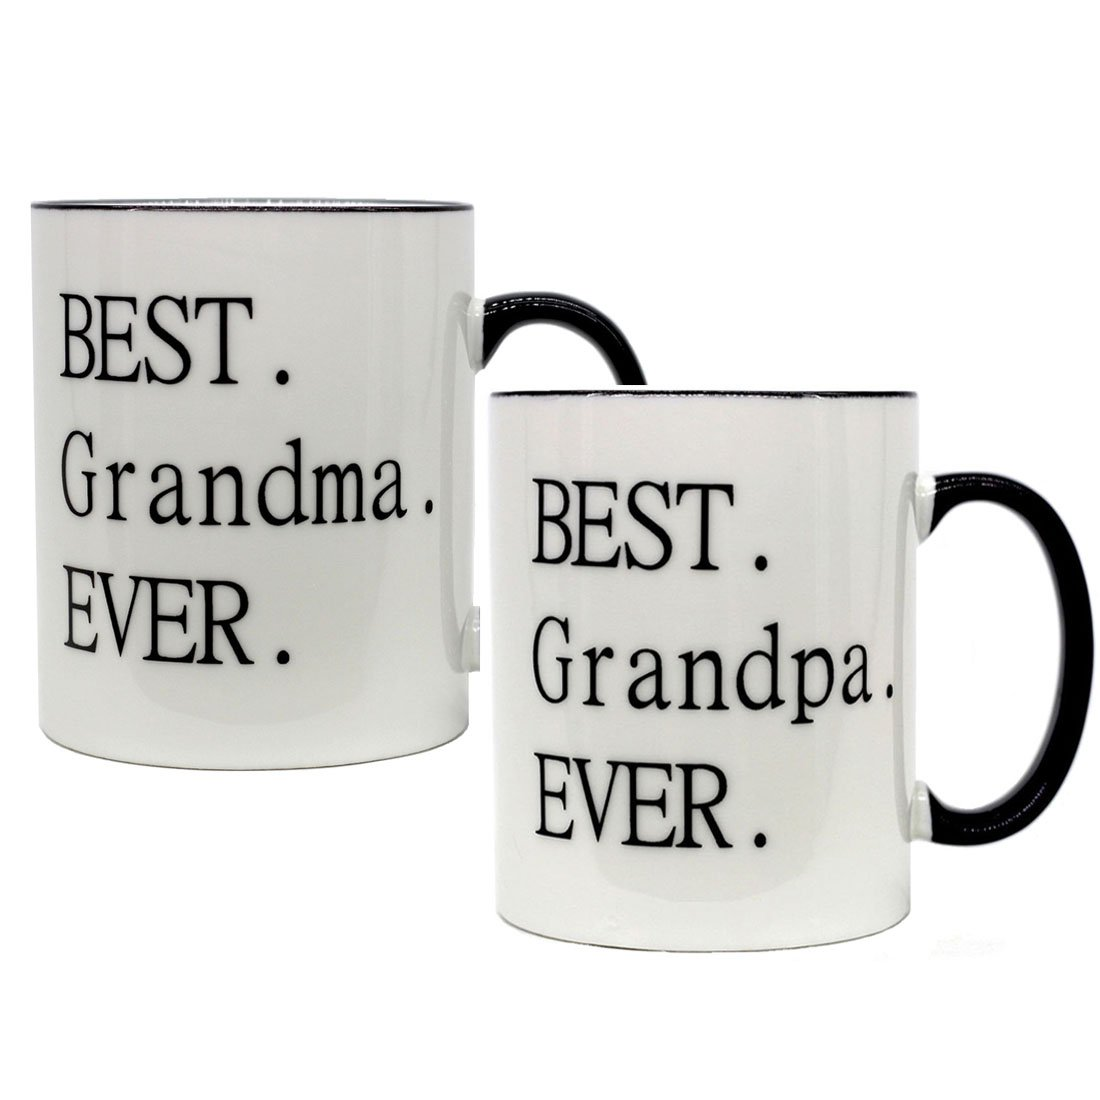 Aunt Mug Funny Gift For Uncle